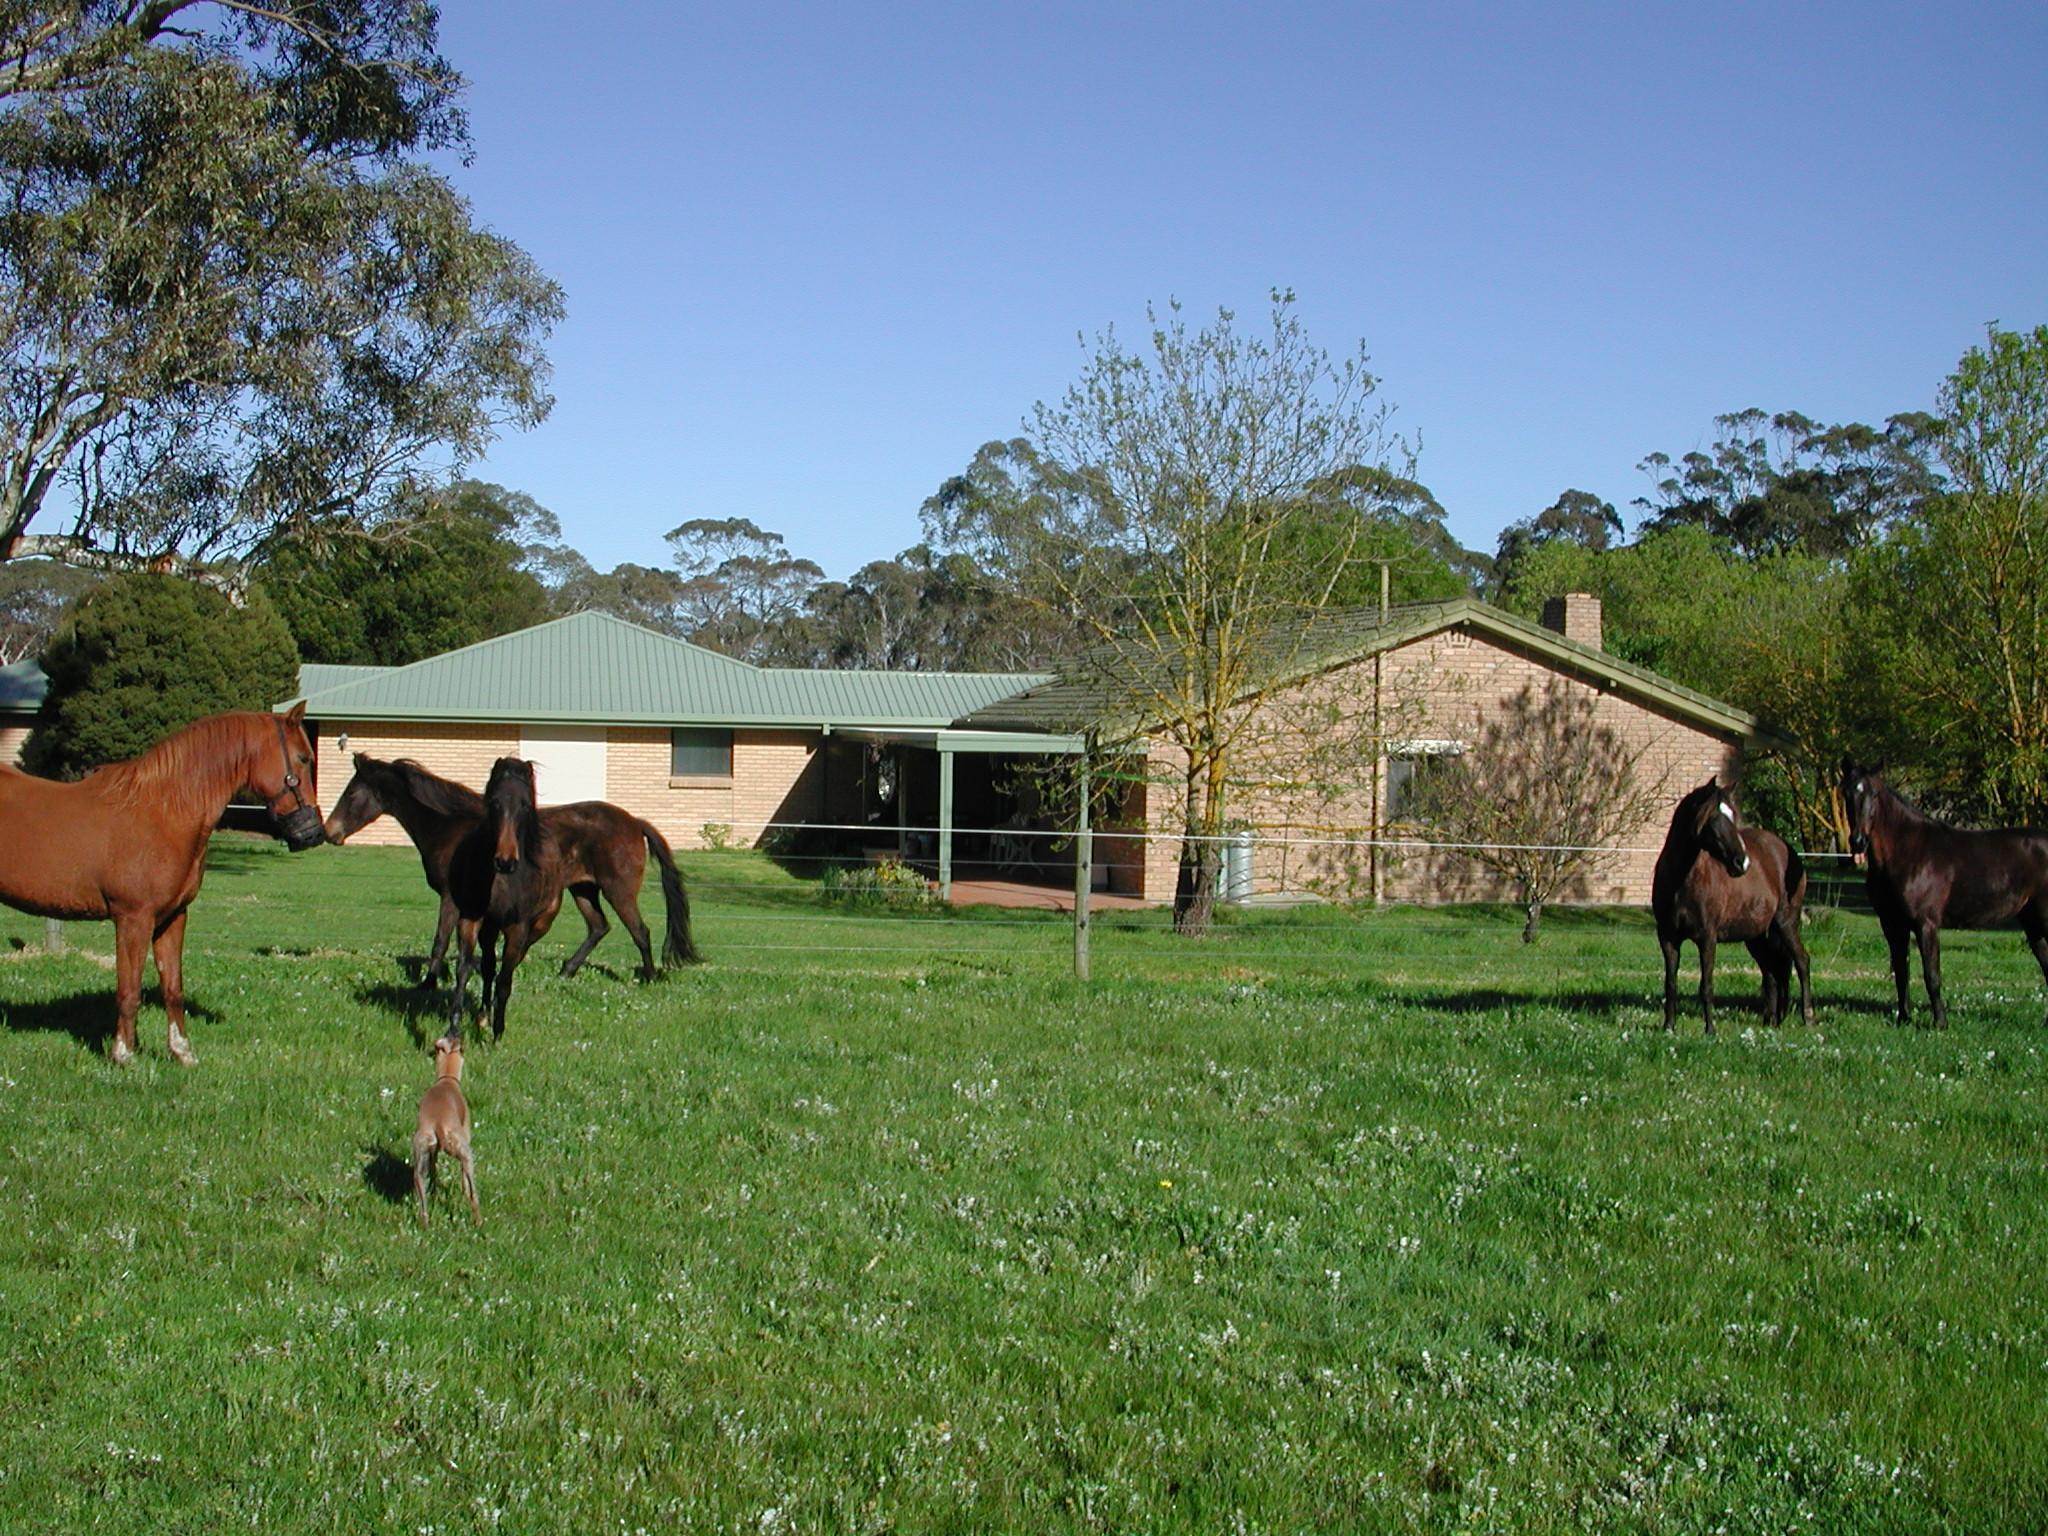 Horses-4.jpeg